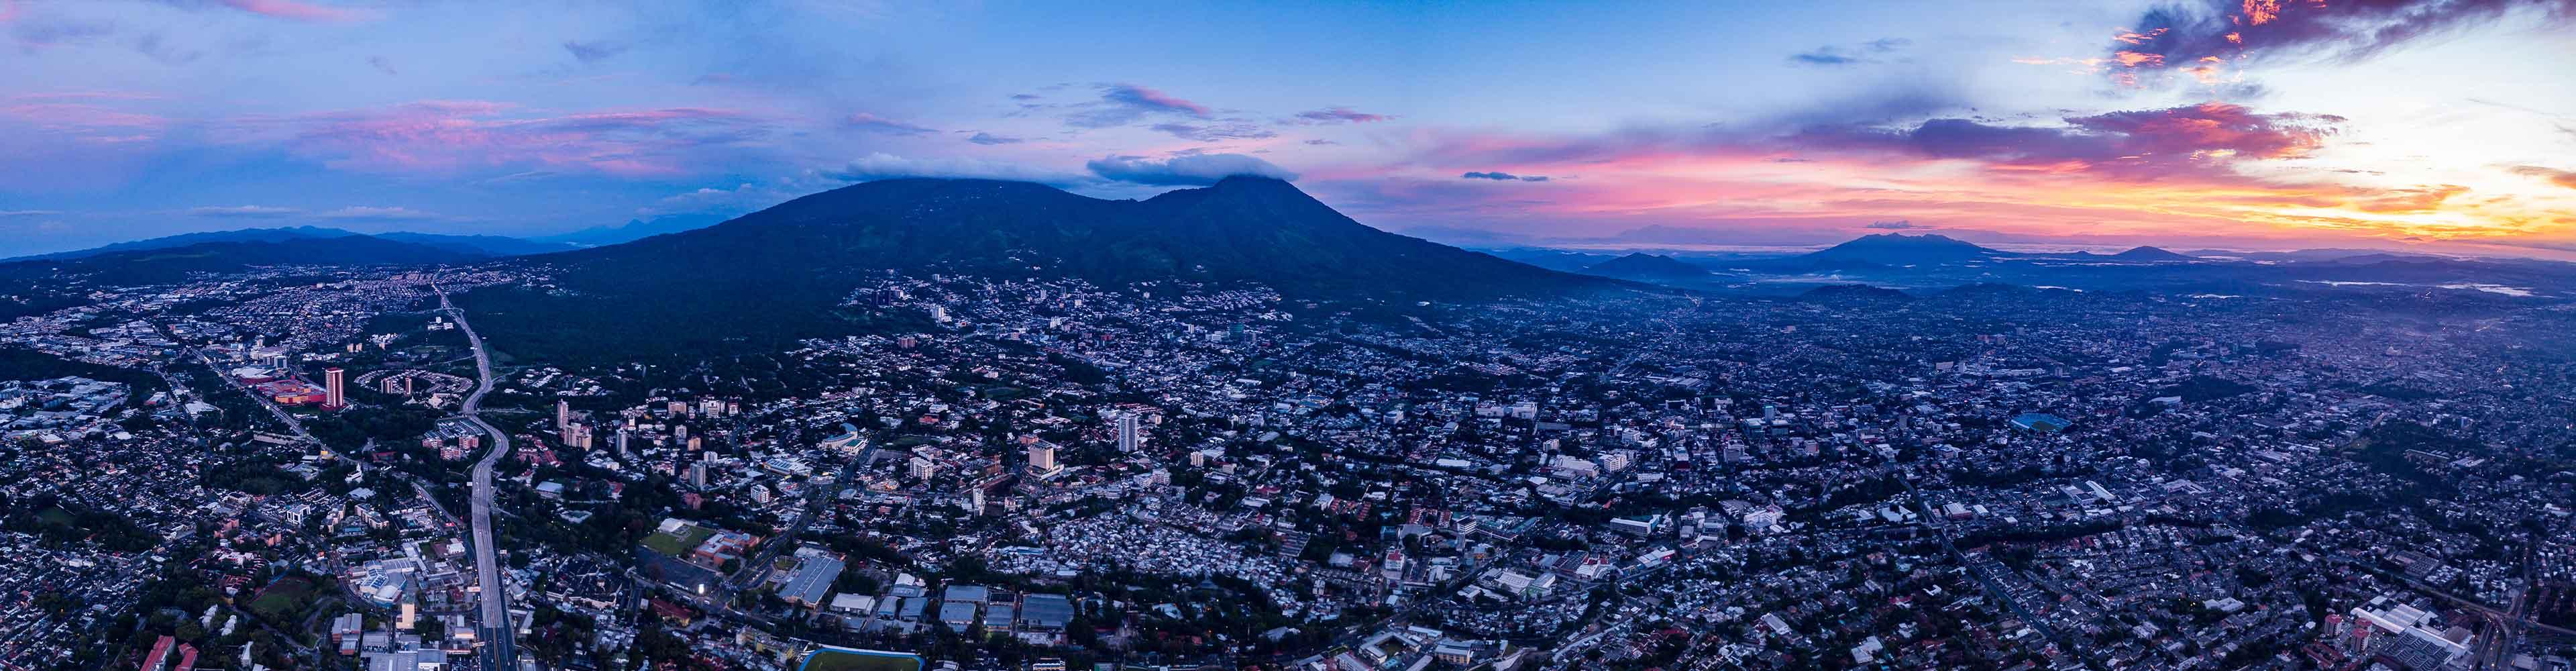 Best of El Salvador